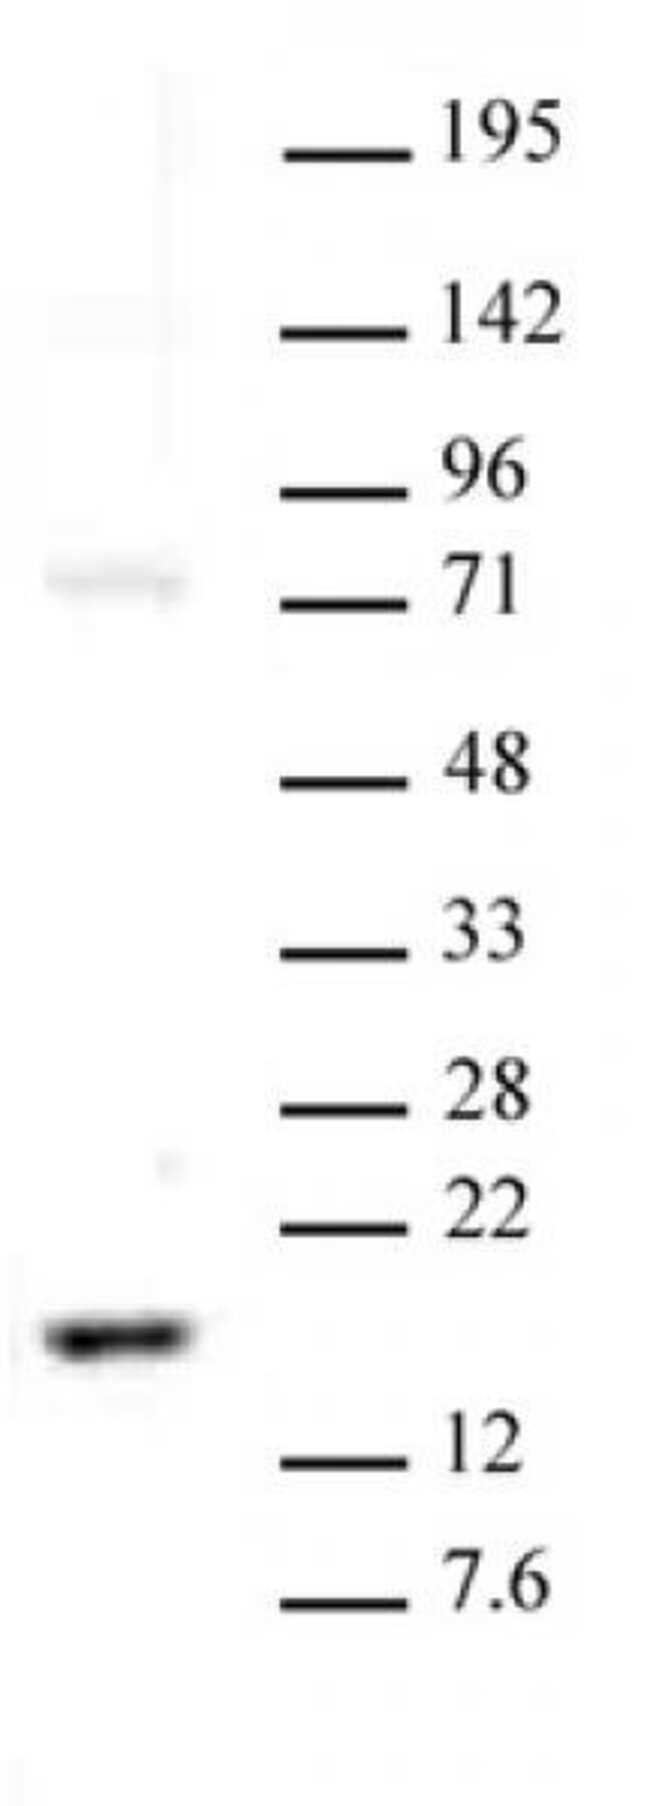 Histone H3K23me2 Rabbit anti-Human, Unconjugated, Polyclonal, Active Motif:Antibodies:Primary